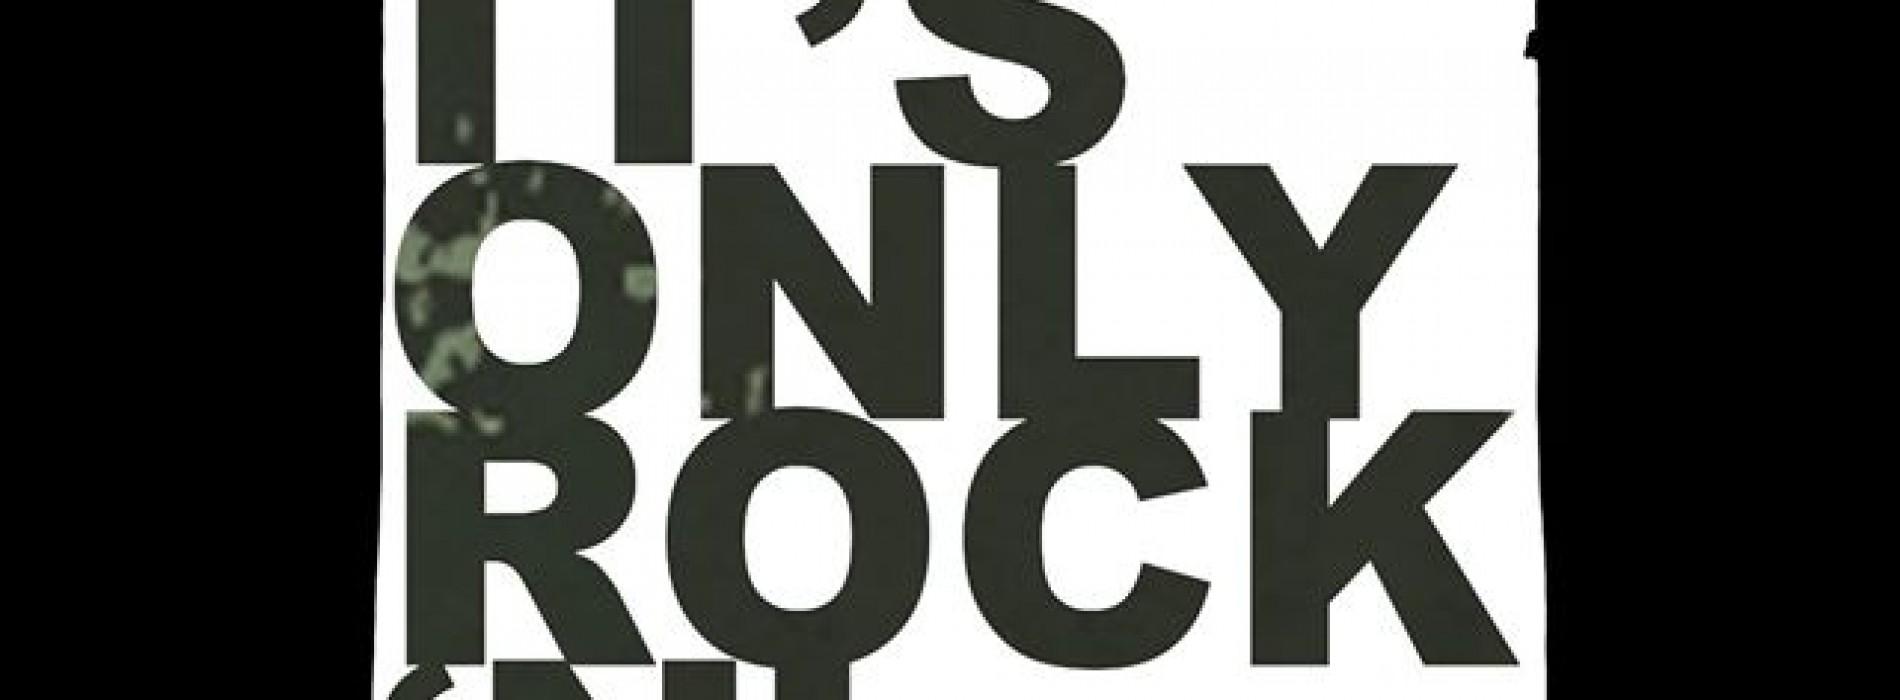 Rock N Roll (Concert Series) Merchandise